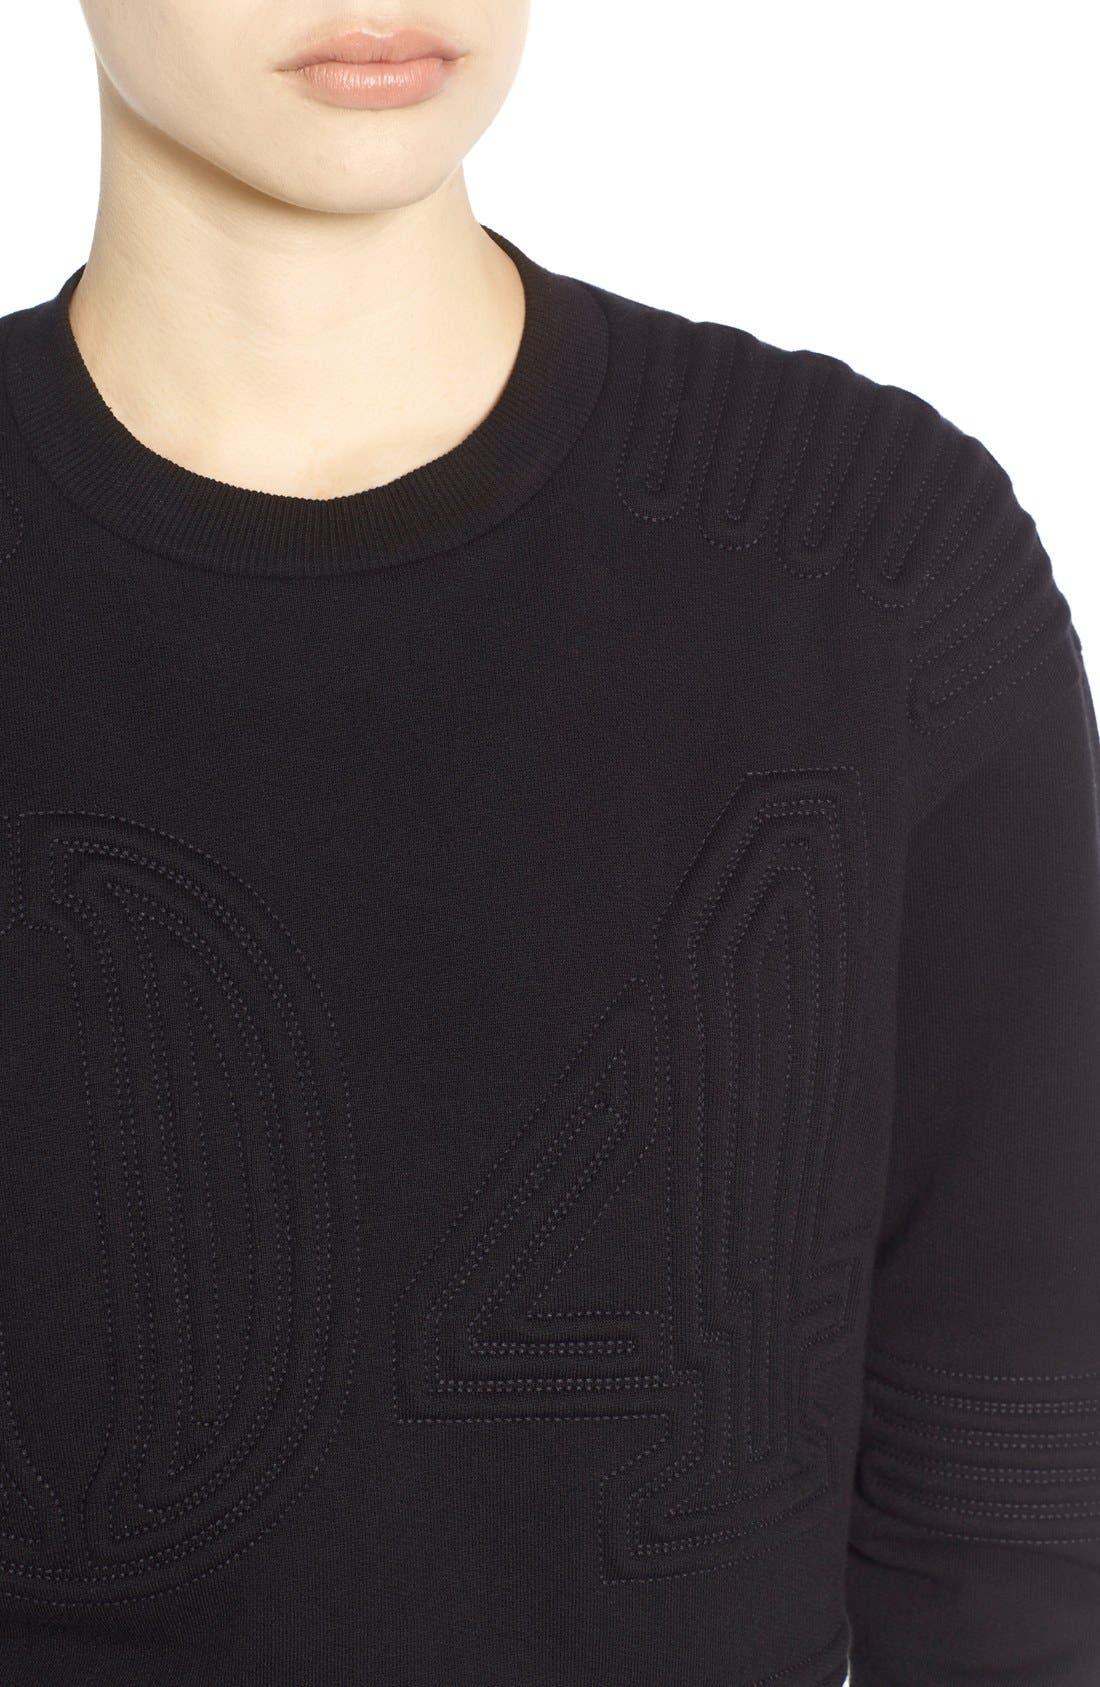 Corded 04 Sweatshirt,                             Alternate thumbnail 2, color,                             001